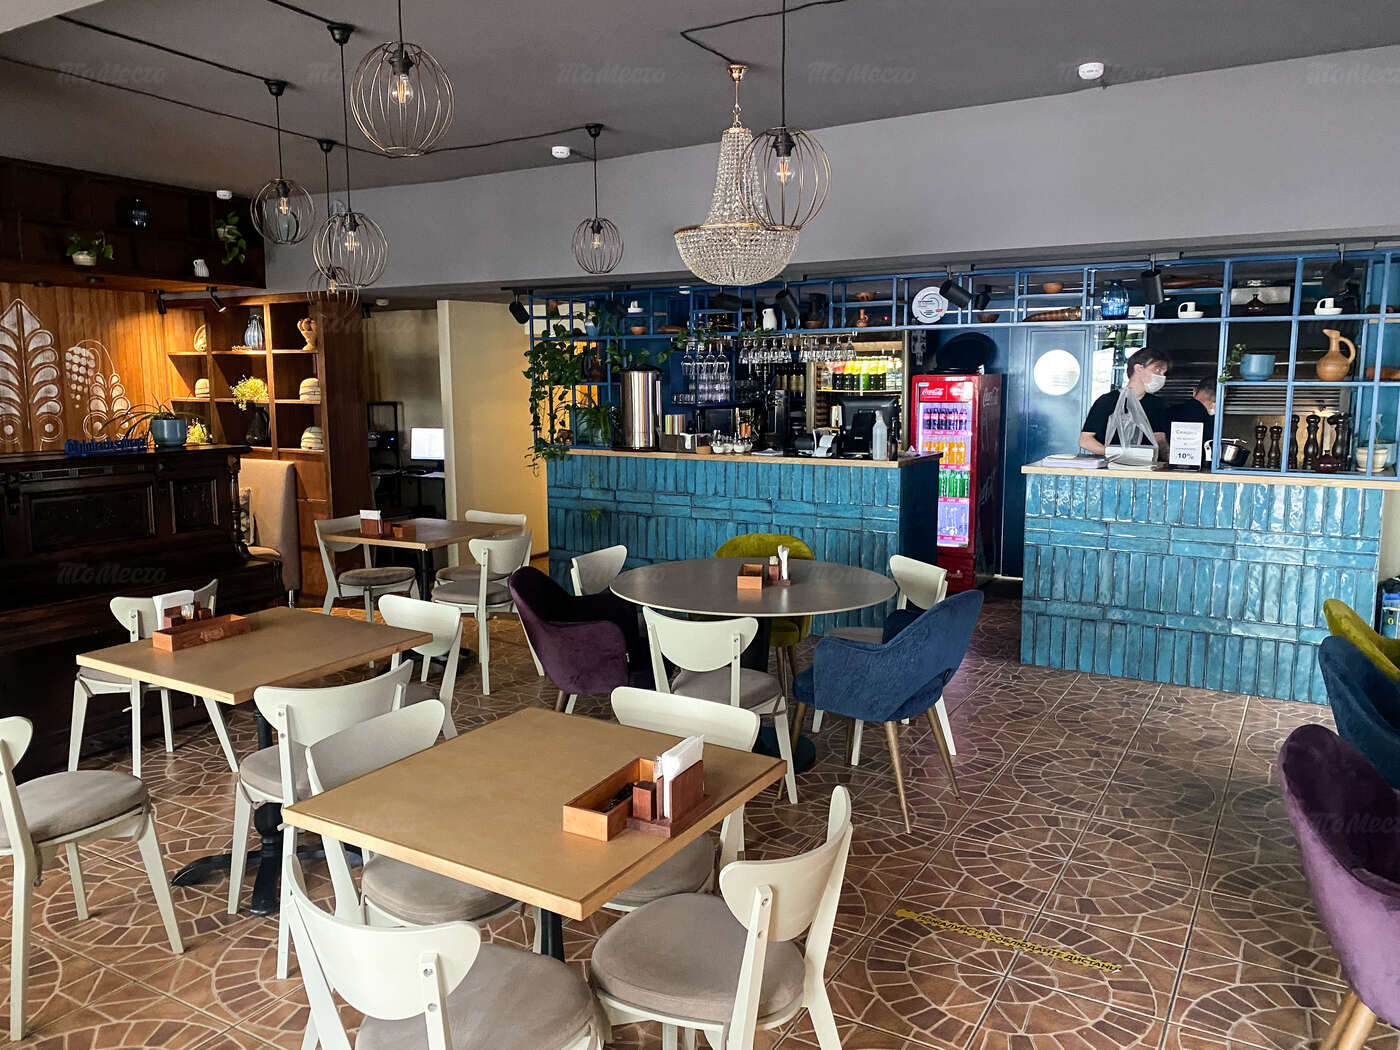 Банкеты кафе Хинкали & Хачапури на Ленина фото 10